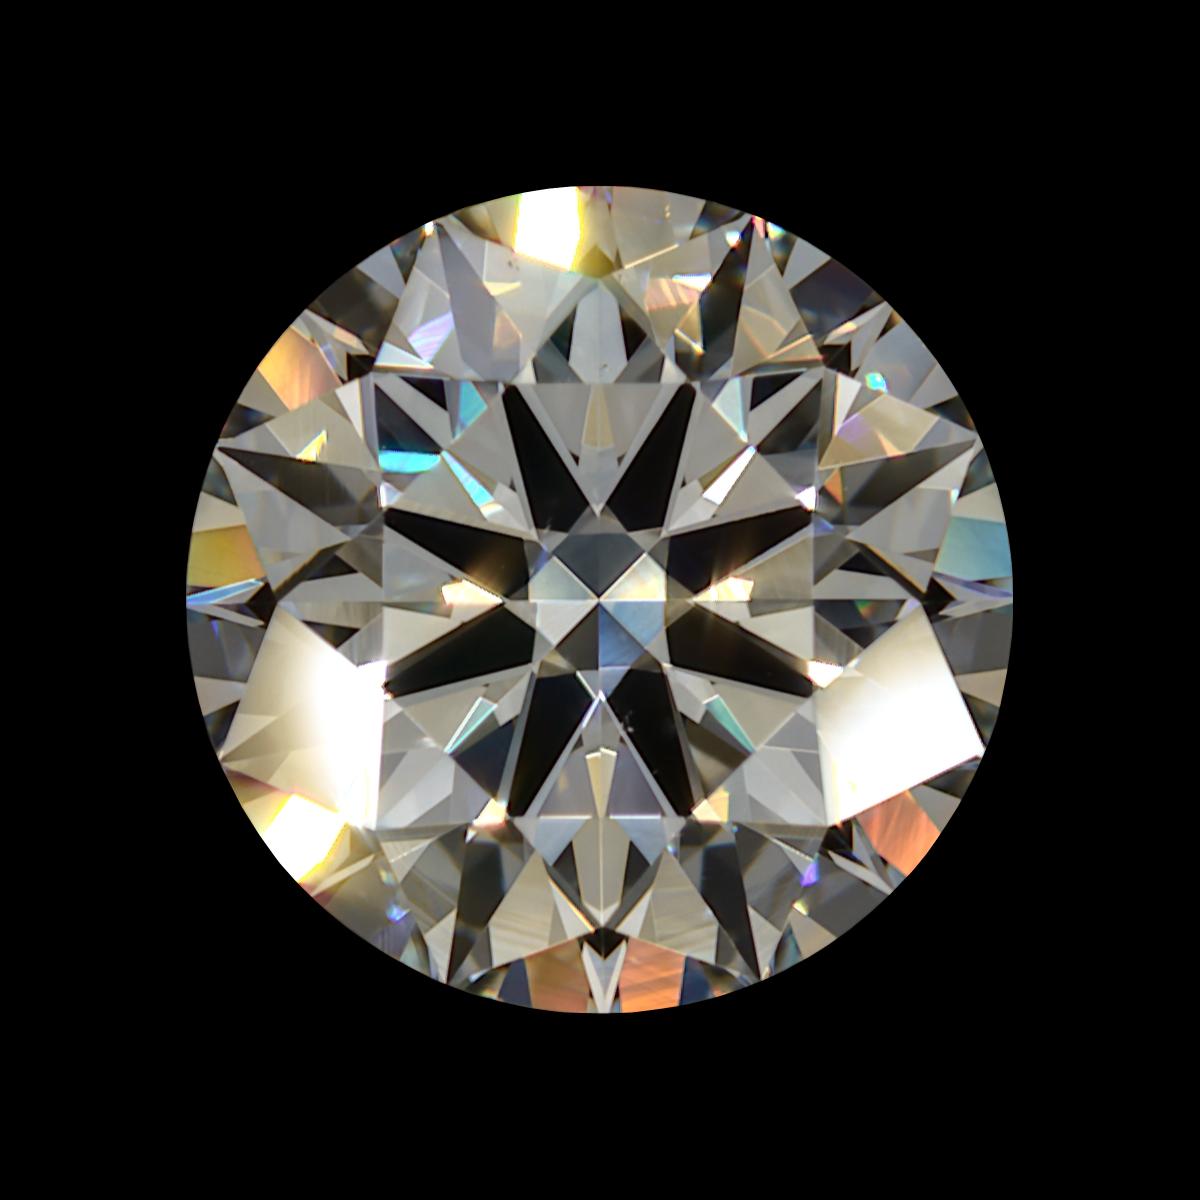 https://cdn.briangavindiamonds.com/files/mp4/BLAGS-104108734015/BLAGS-104108734015-Fire-02.mp4